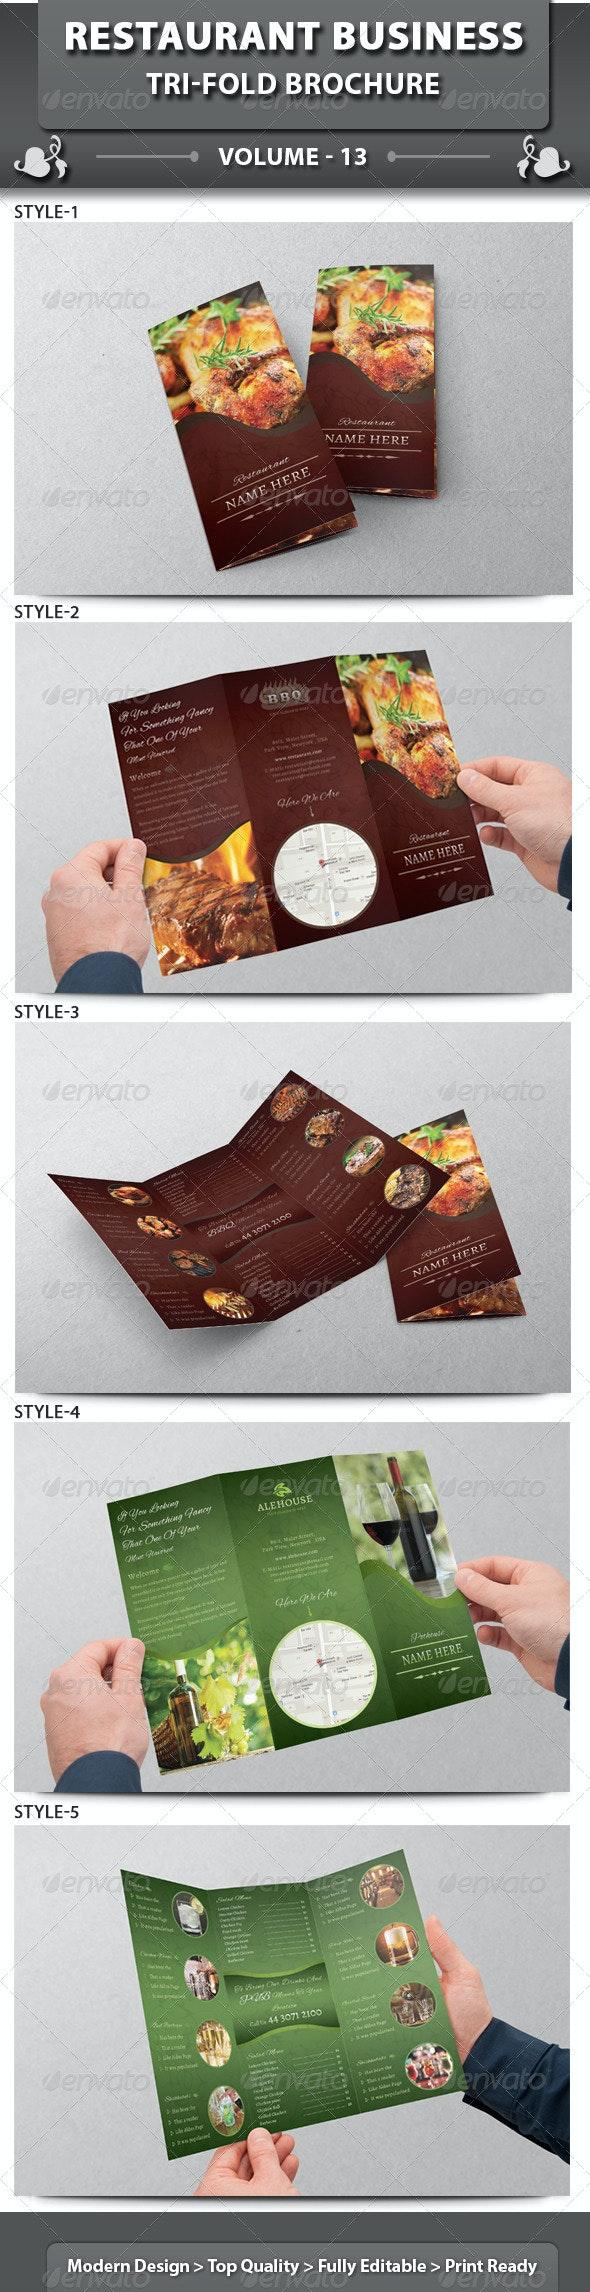 Restaurant Business Tri-fold Brochure | Volume 13 - Corporate Brochures